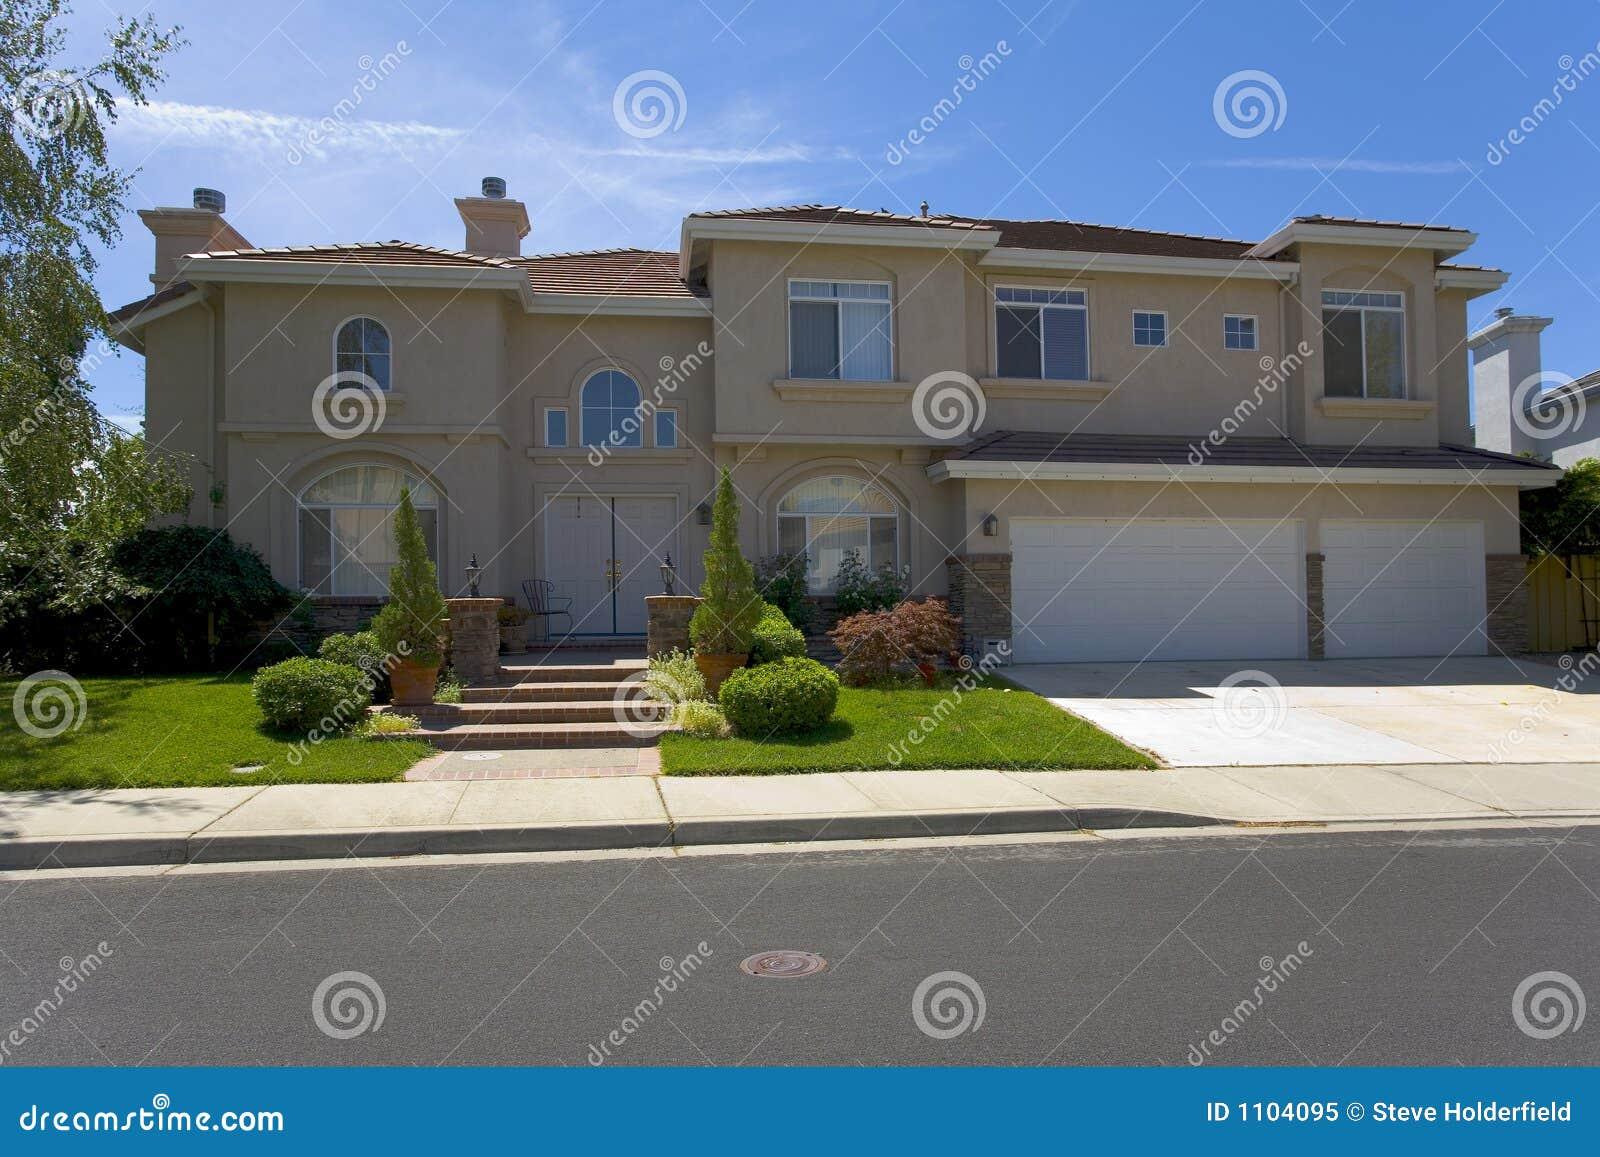 grande maison contemporaine luxueuse de stuc image stock image 1104095. Black Bedroom Furniture Sets. Home Design Ideas